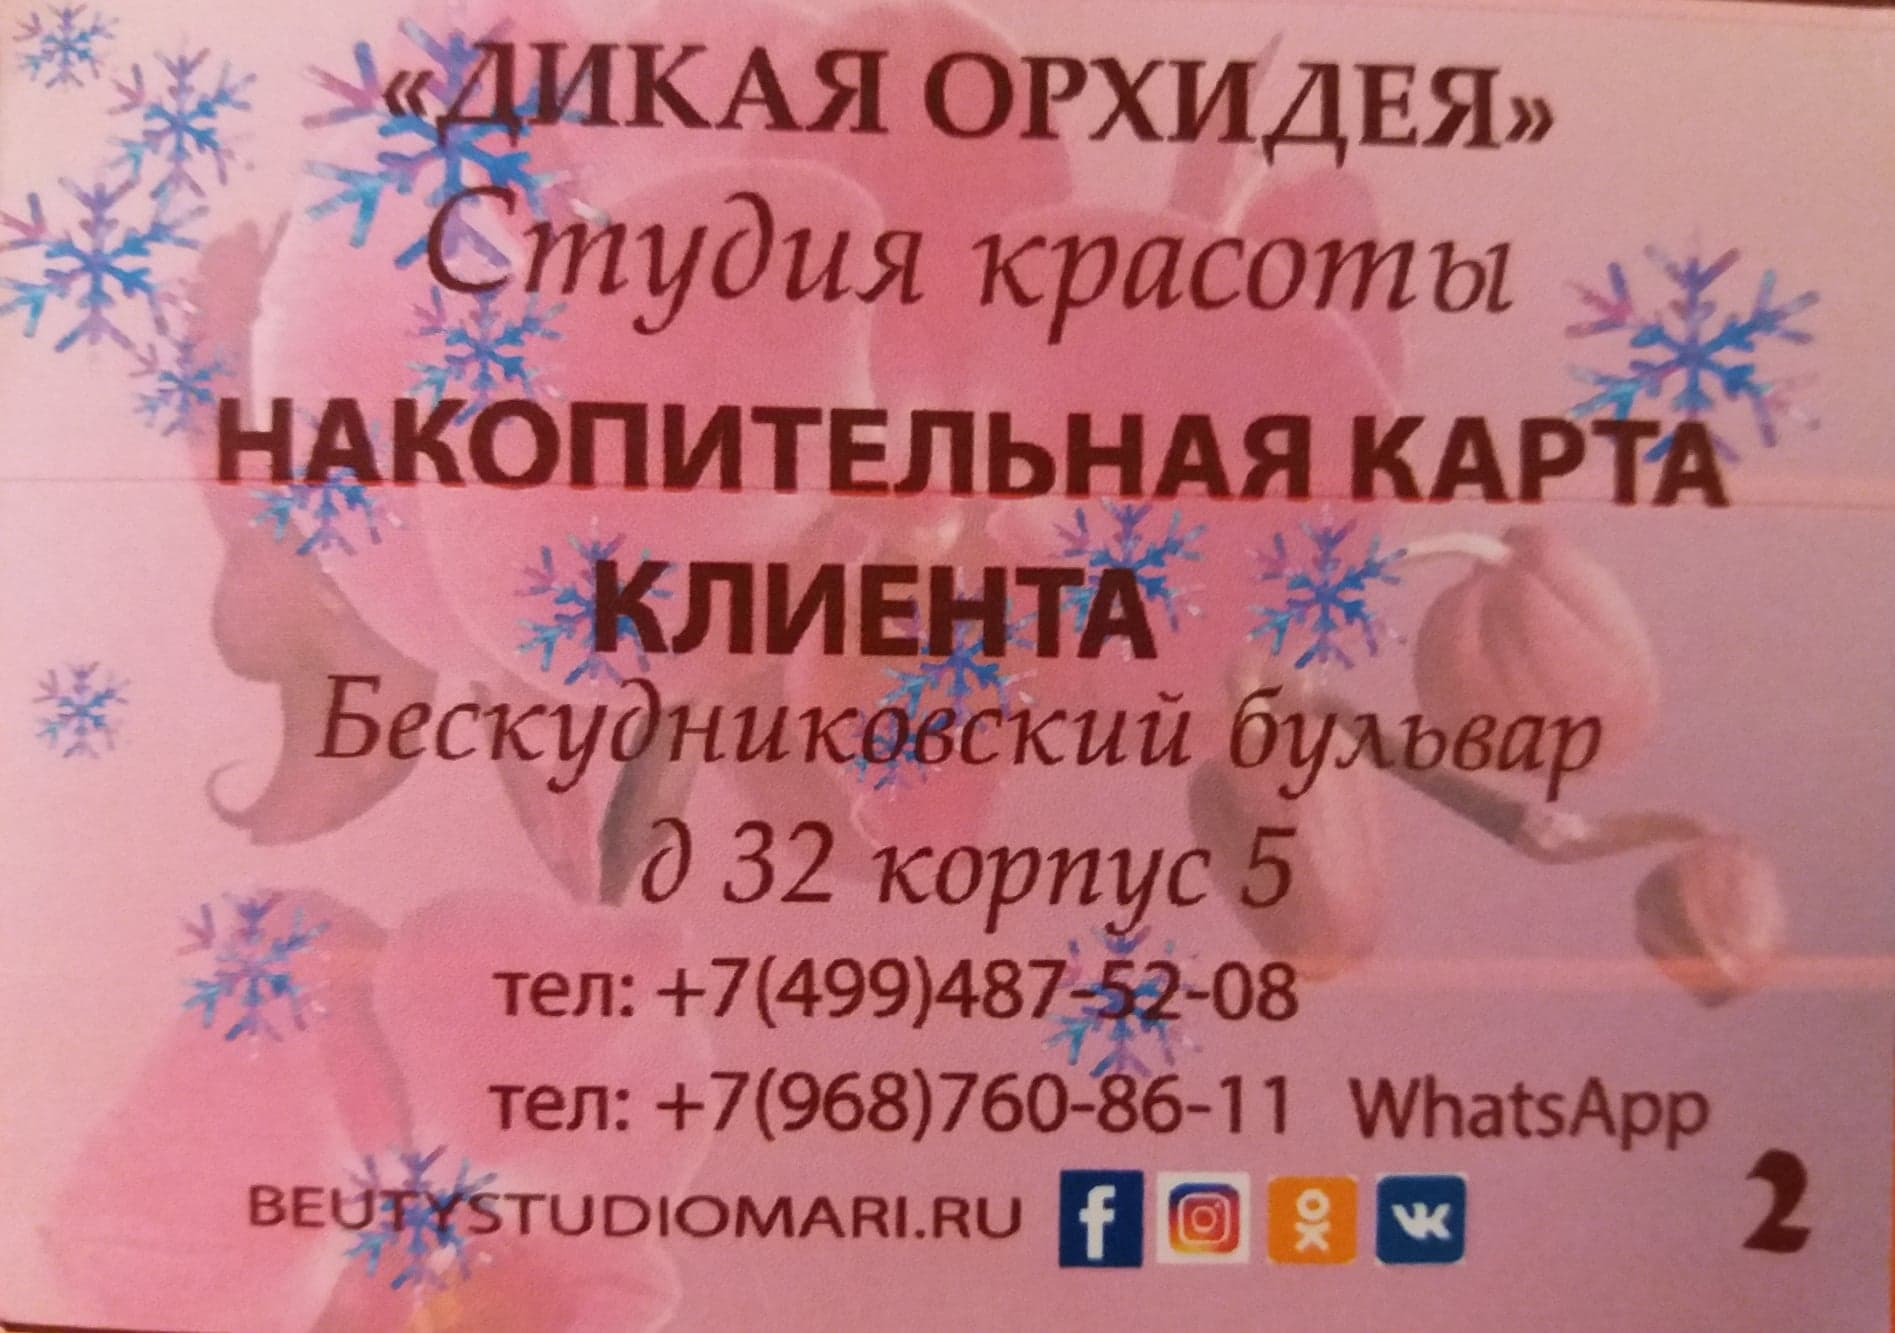 50227113_1198437803652098_6412721601283883008_n